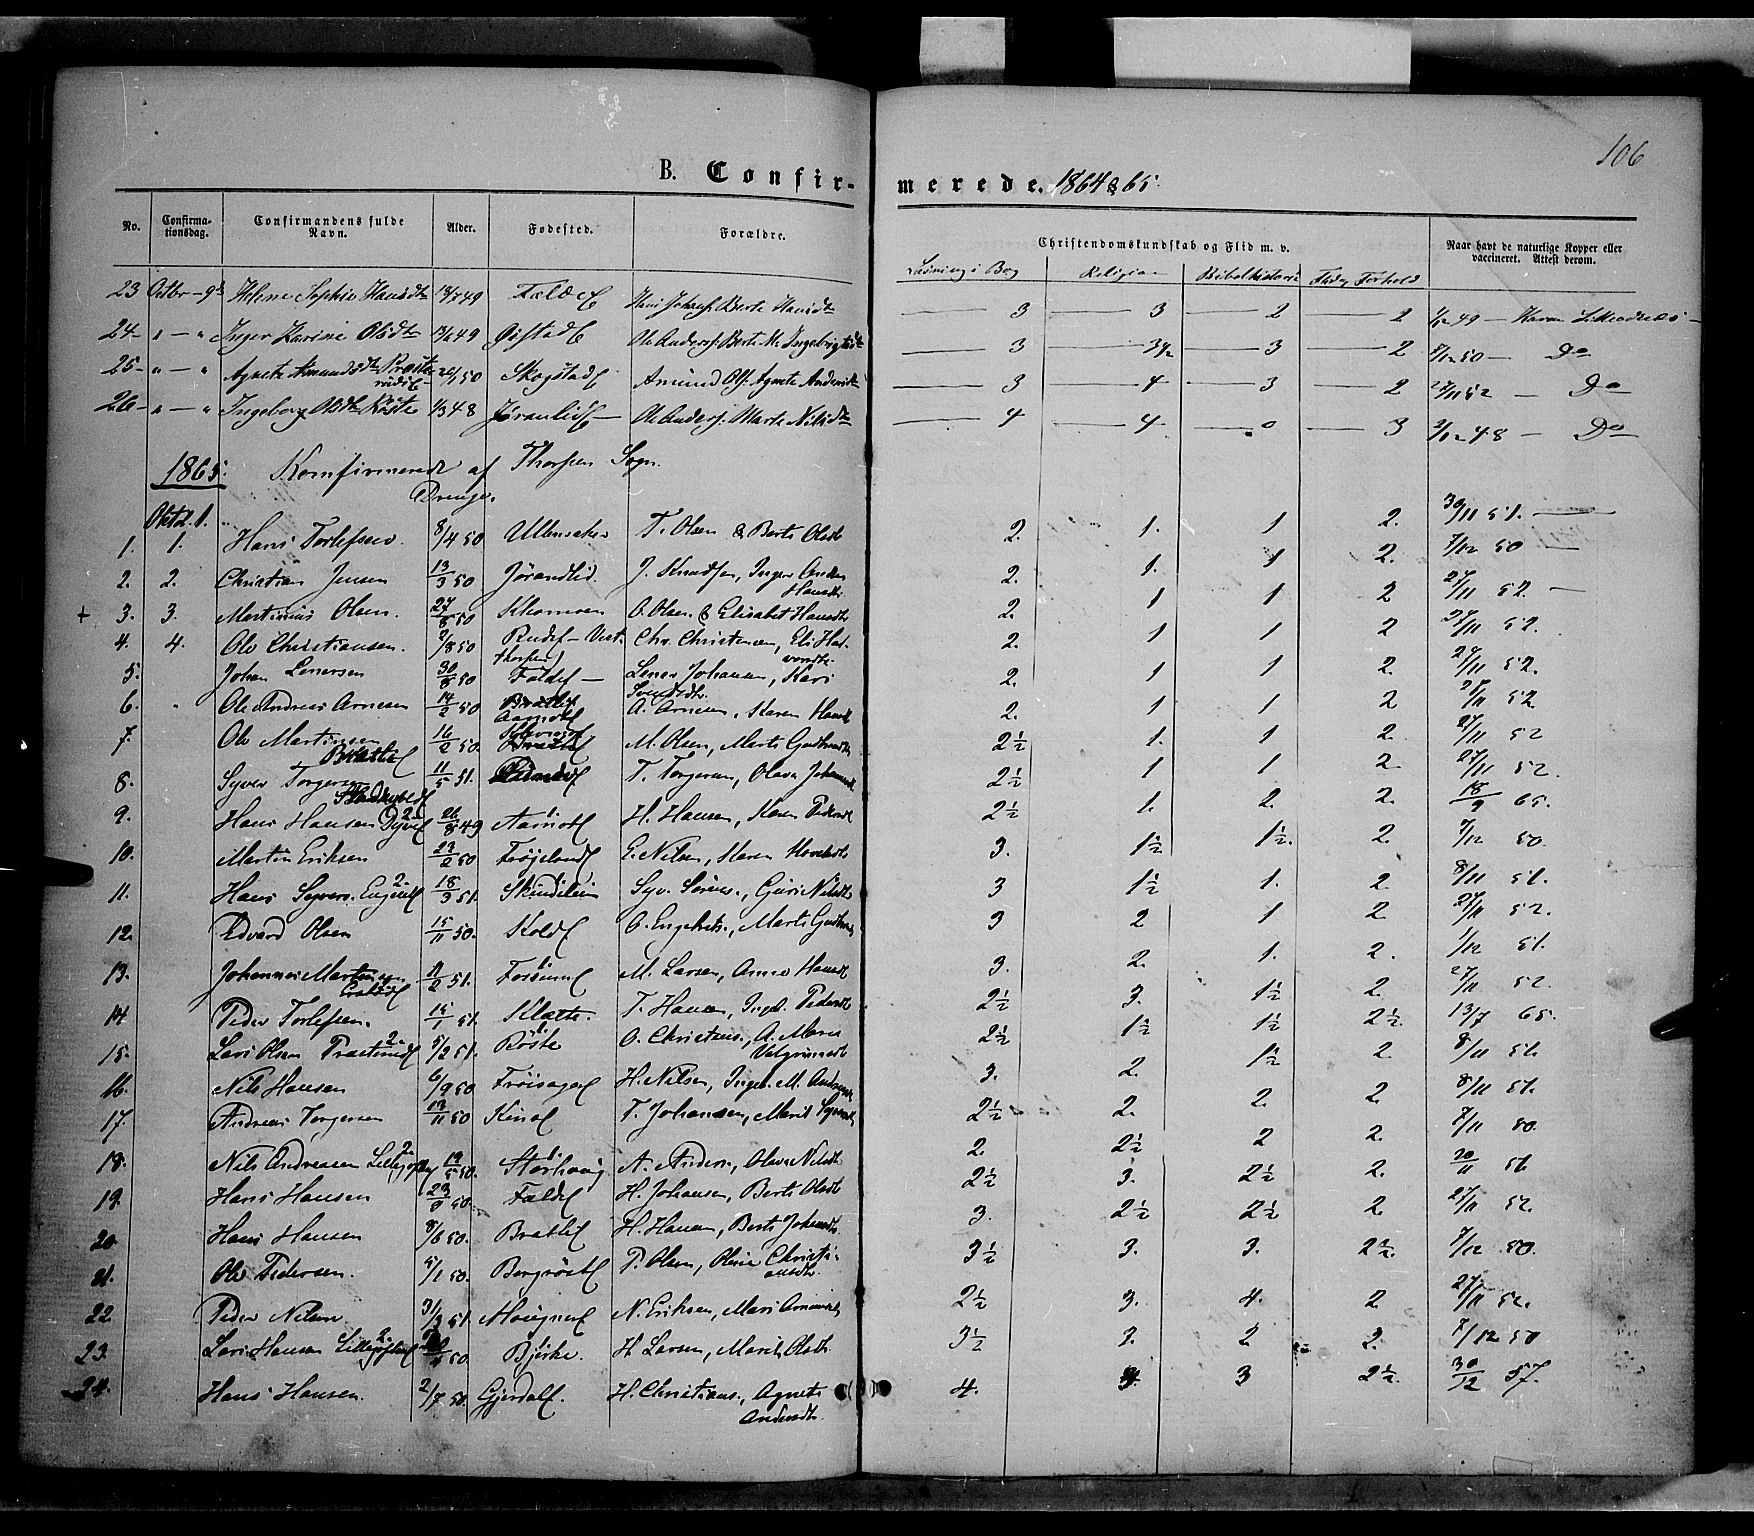 SAH, Nordre Land prestekontor, Ministerialbok nr. 1, 1860-1871, s. 106